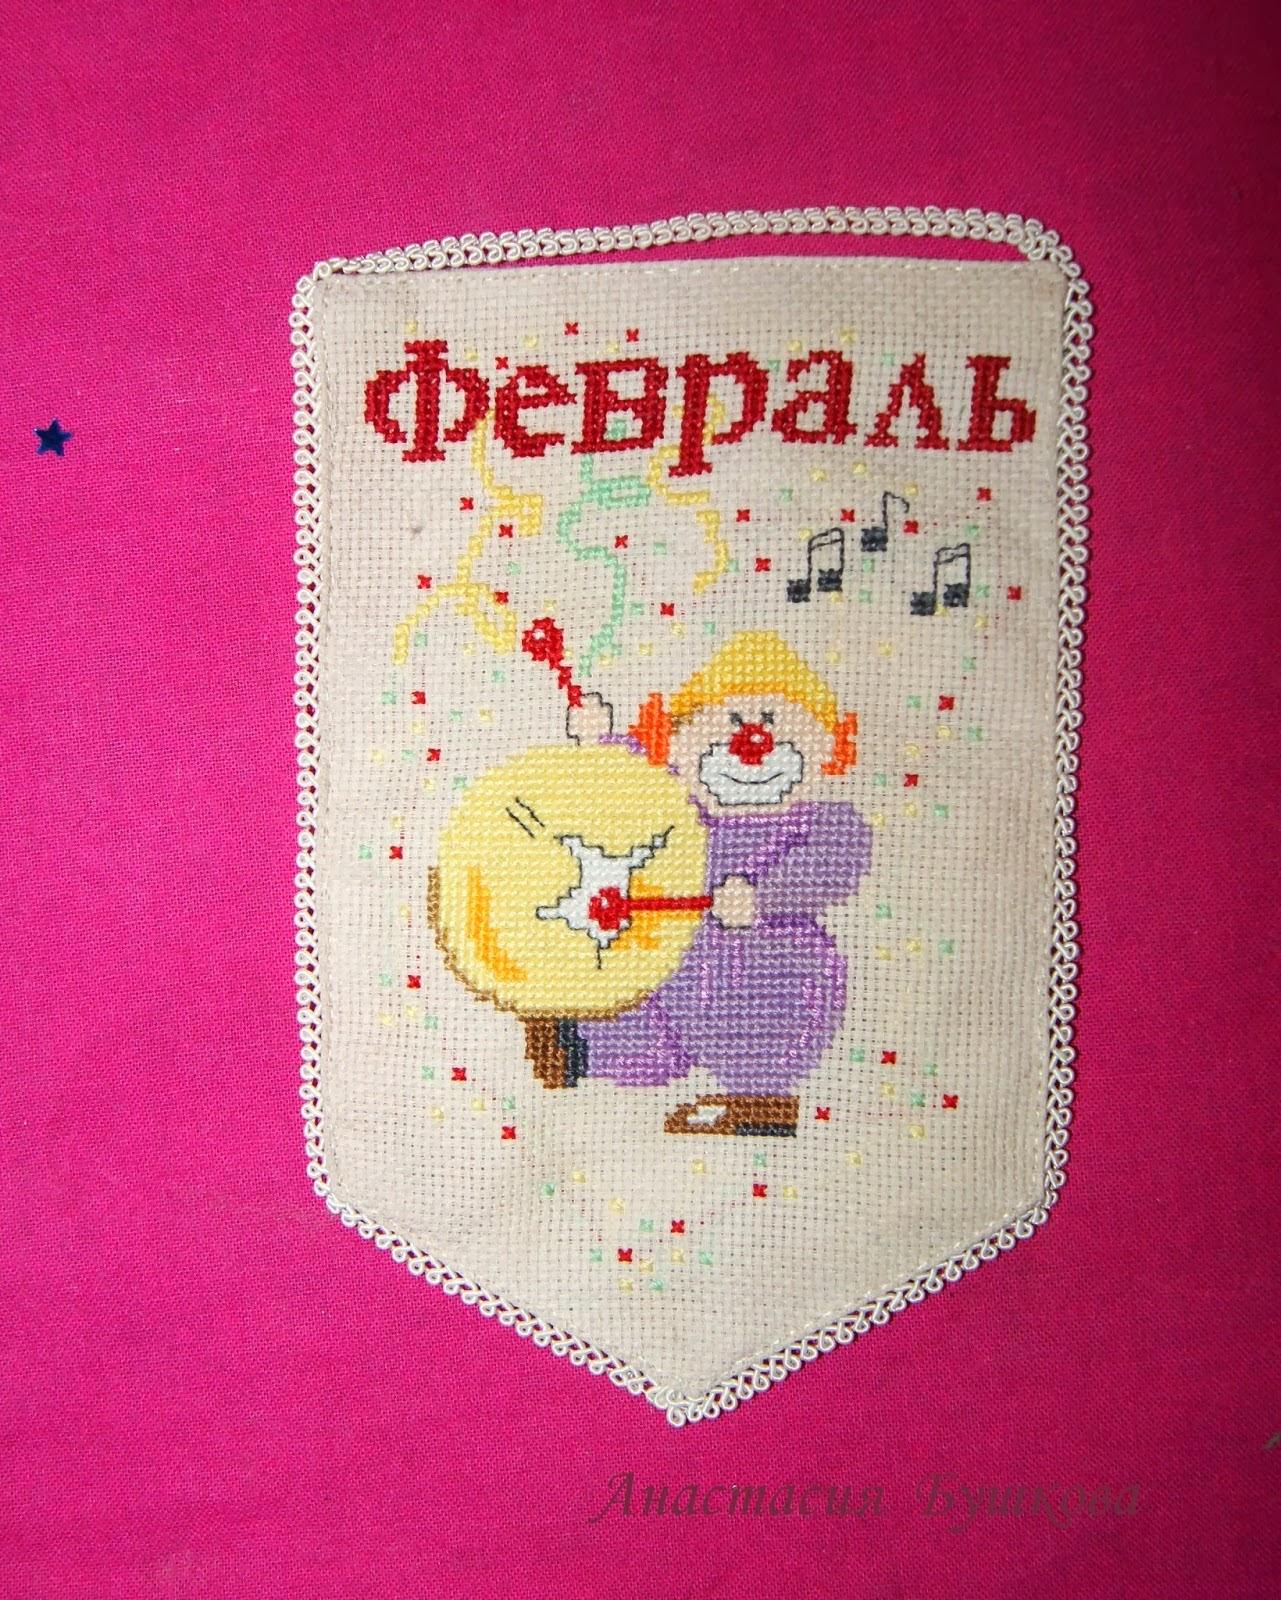 http://nastushin.blogspot.ru/2014/02/sal.html